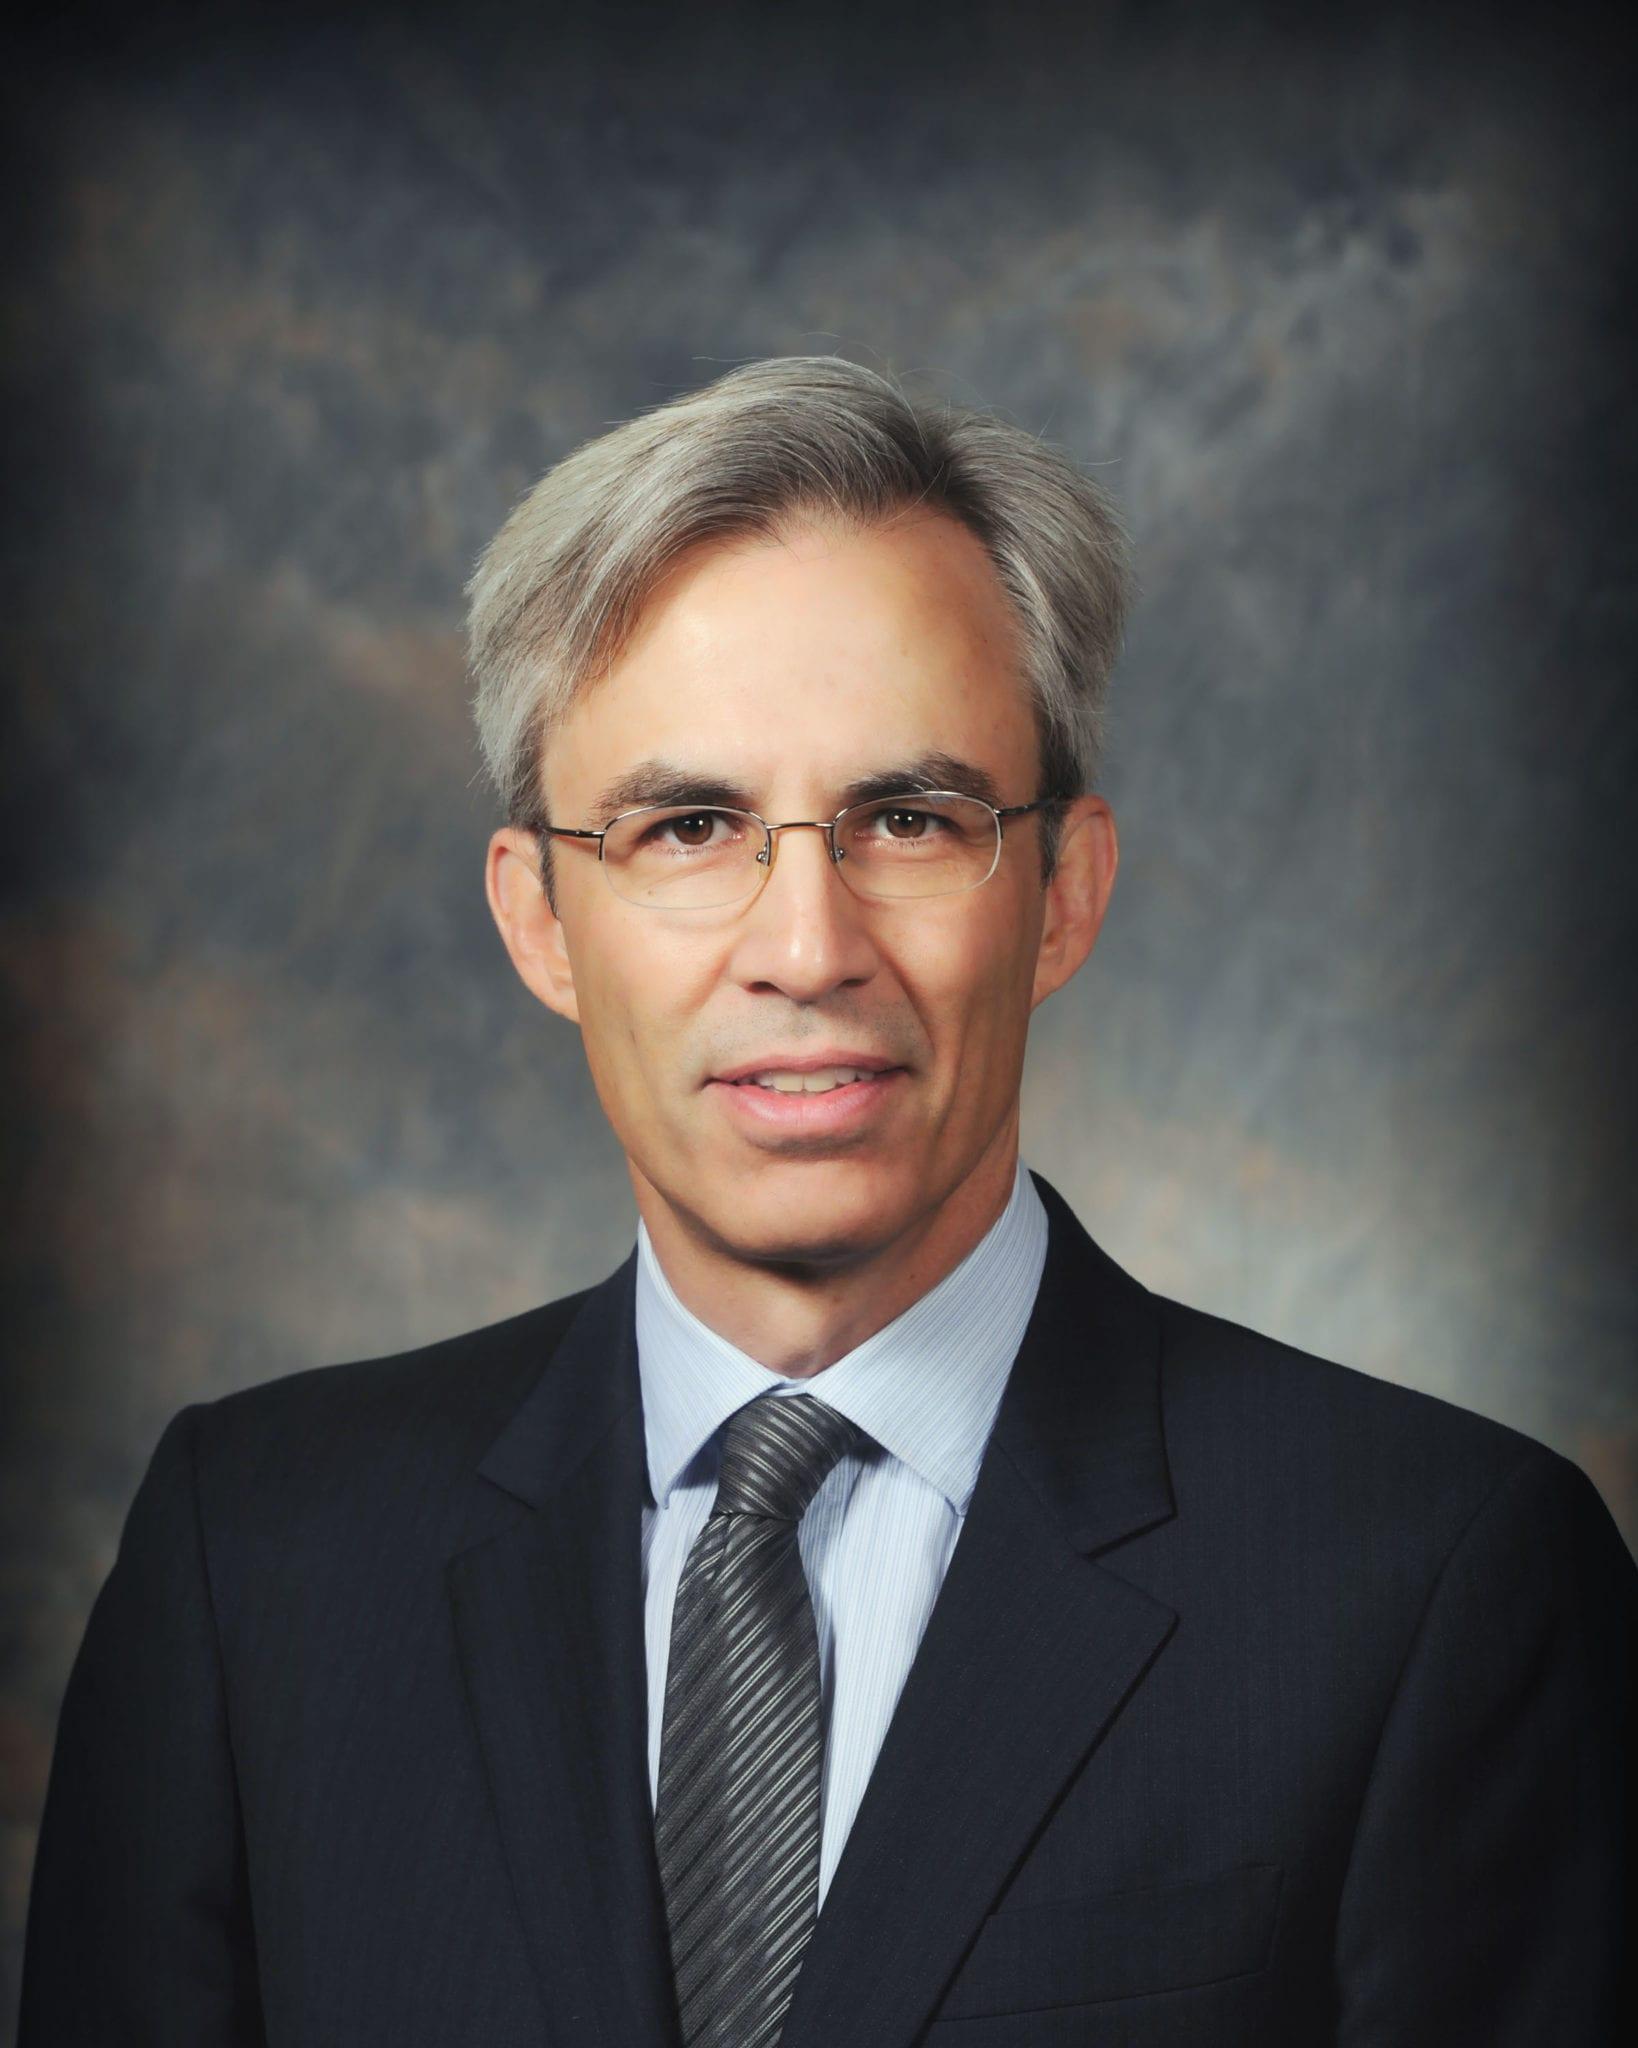 John Axelberg